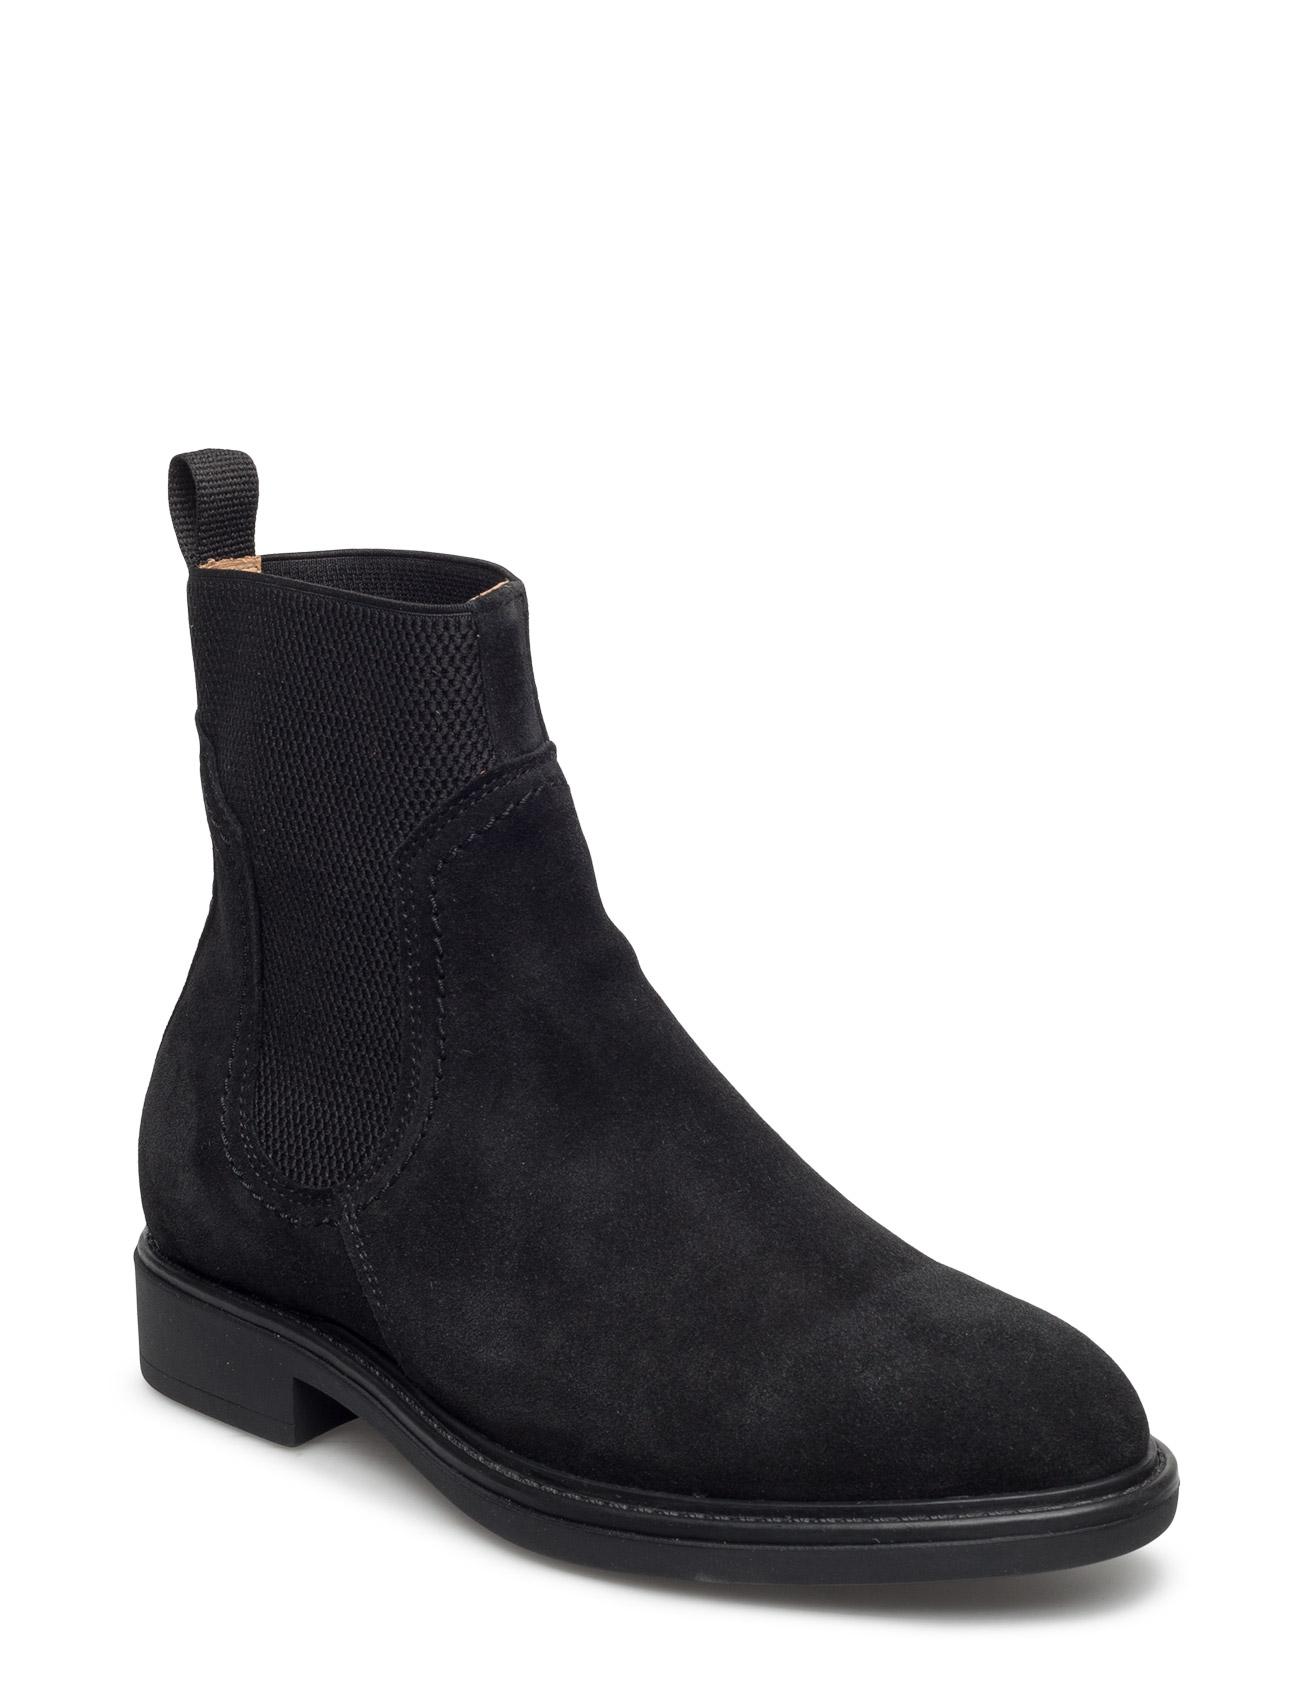 Lydia Mid Boot GANT Støvler til Kvinder i cognac